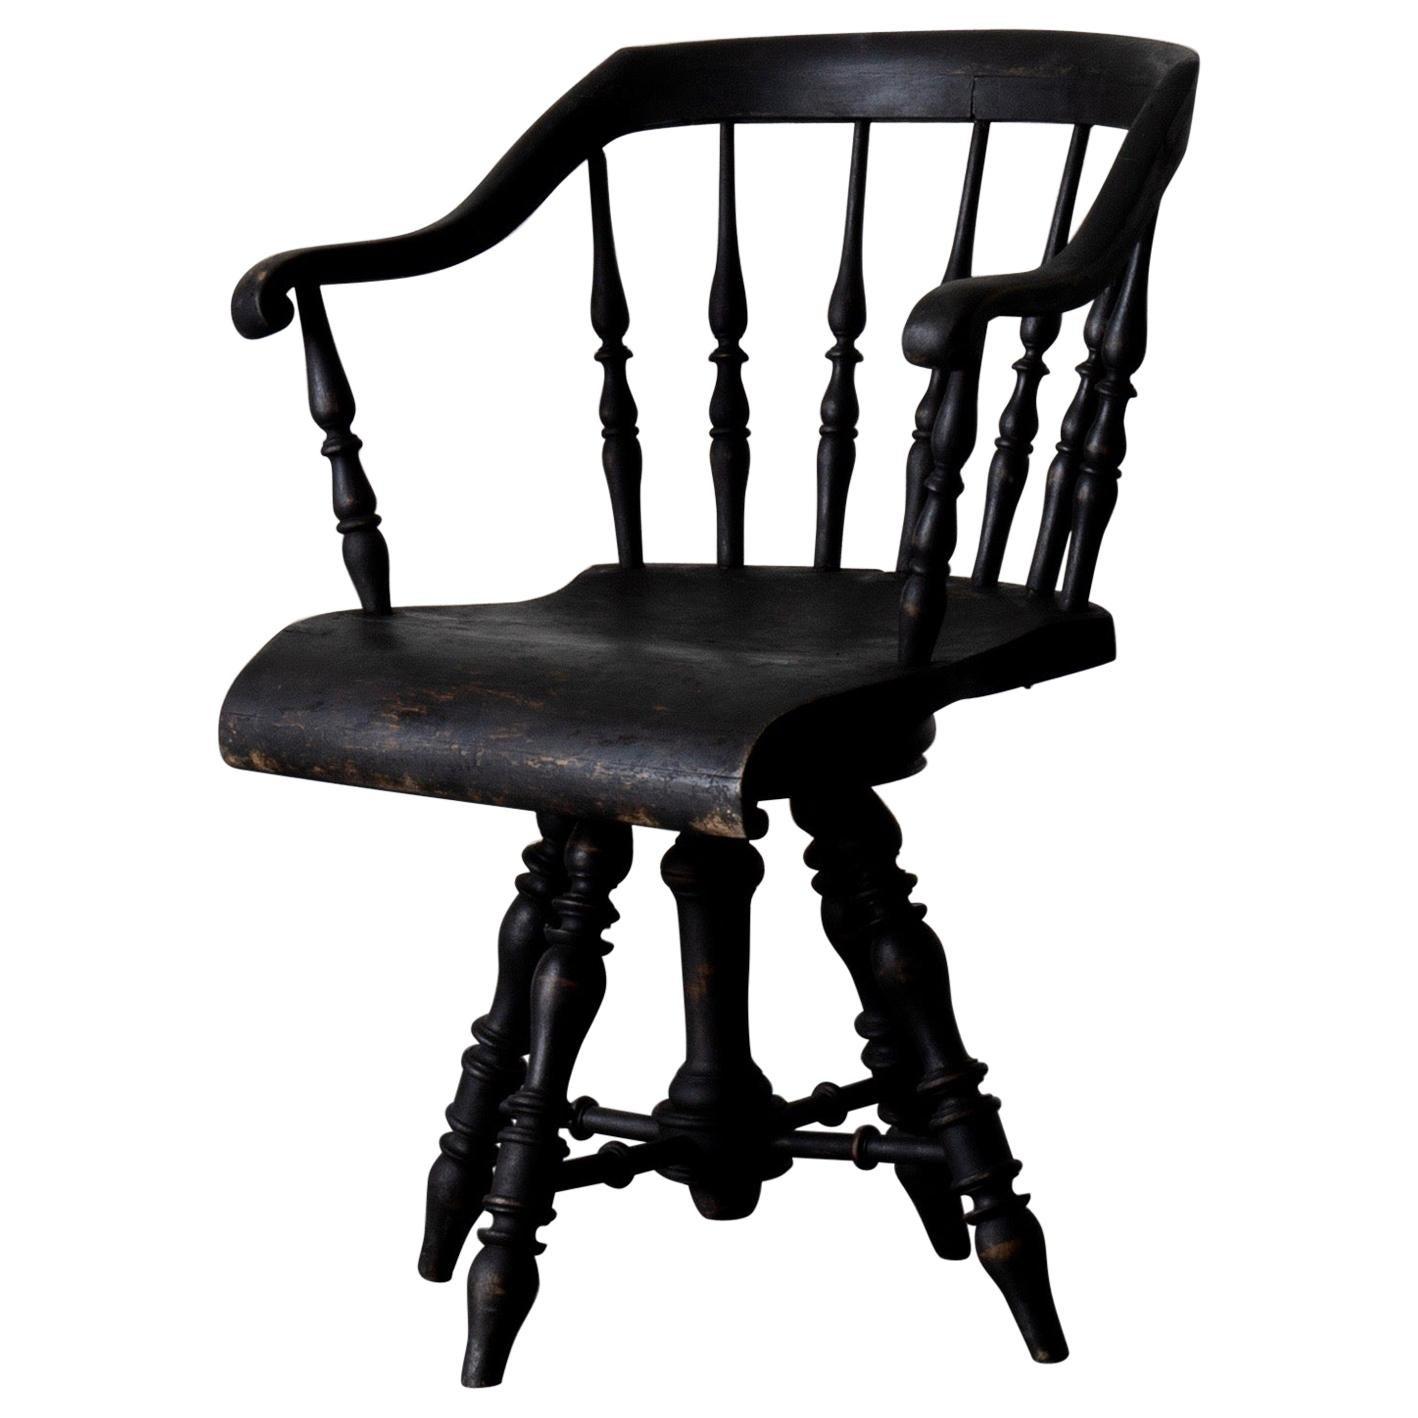 Armchair Captain's Chair Black Swedish 19th Century Sweden